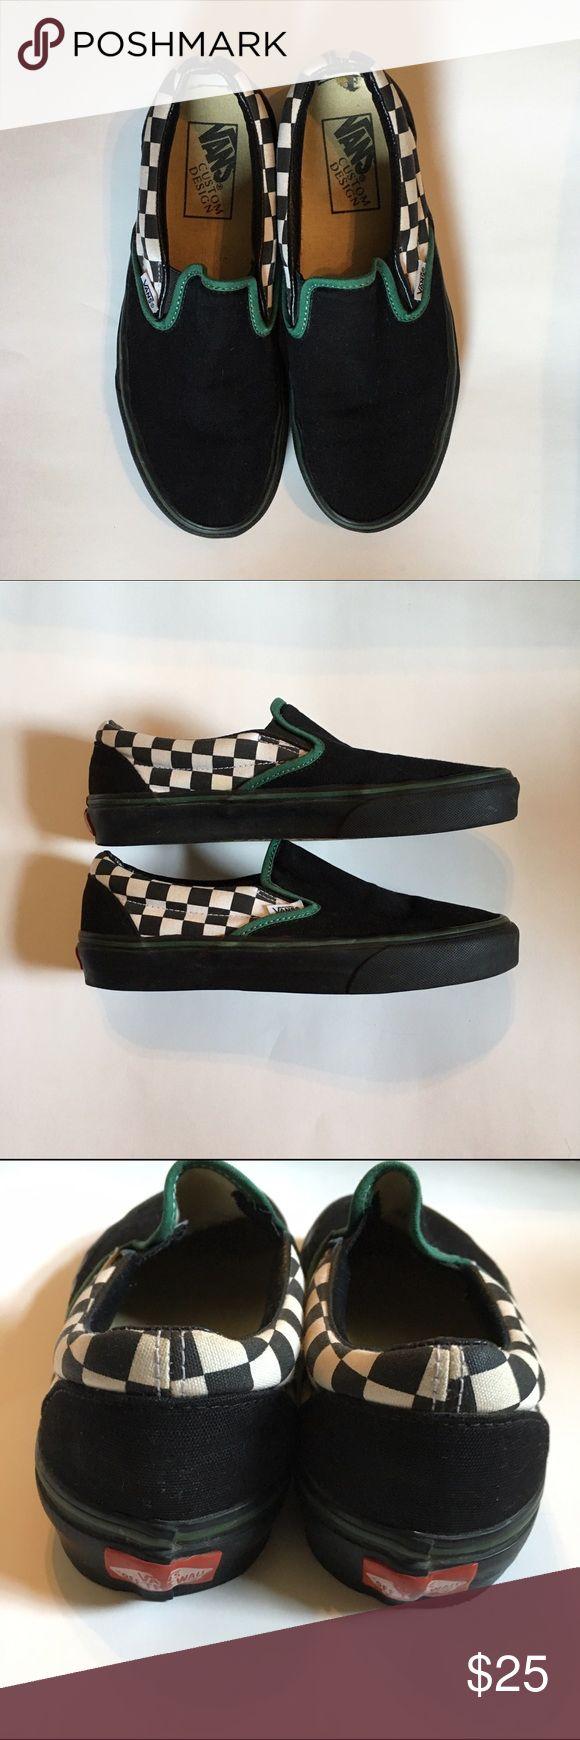 Vans Custom Design